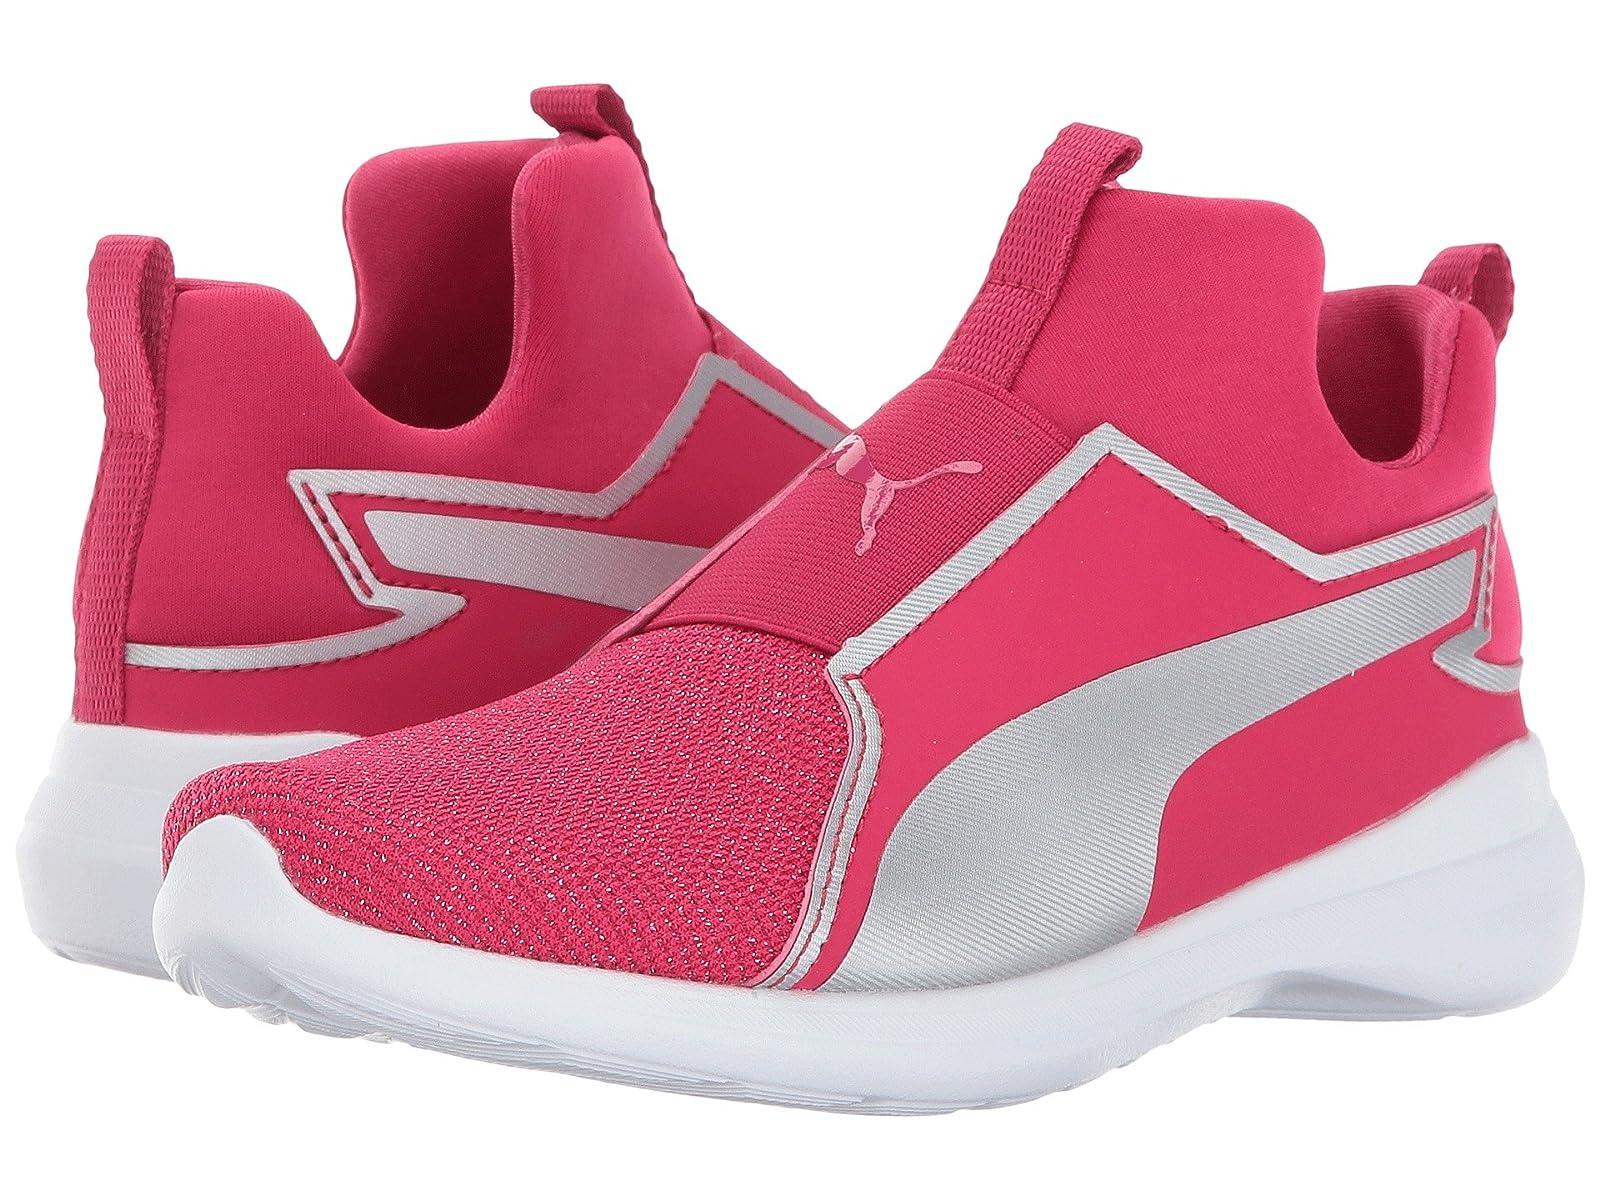 Puma Kids Rebel Mid Gleam (Little Kid/Big Kid)Cheap and distinctive eye-catching shoes